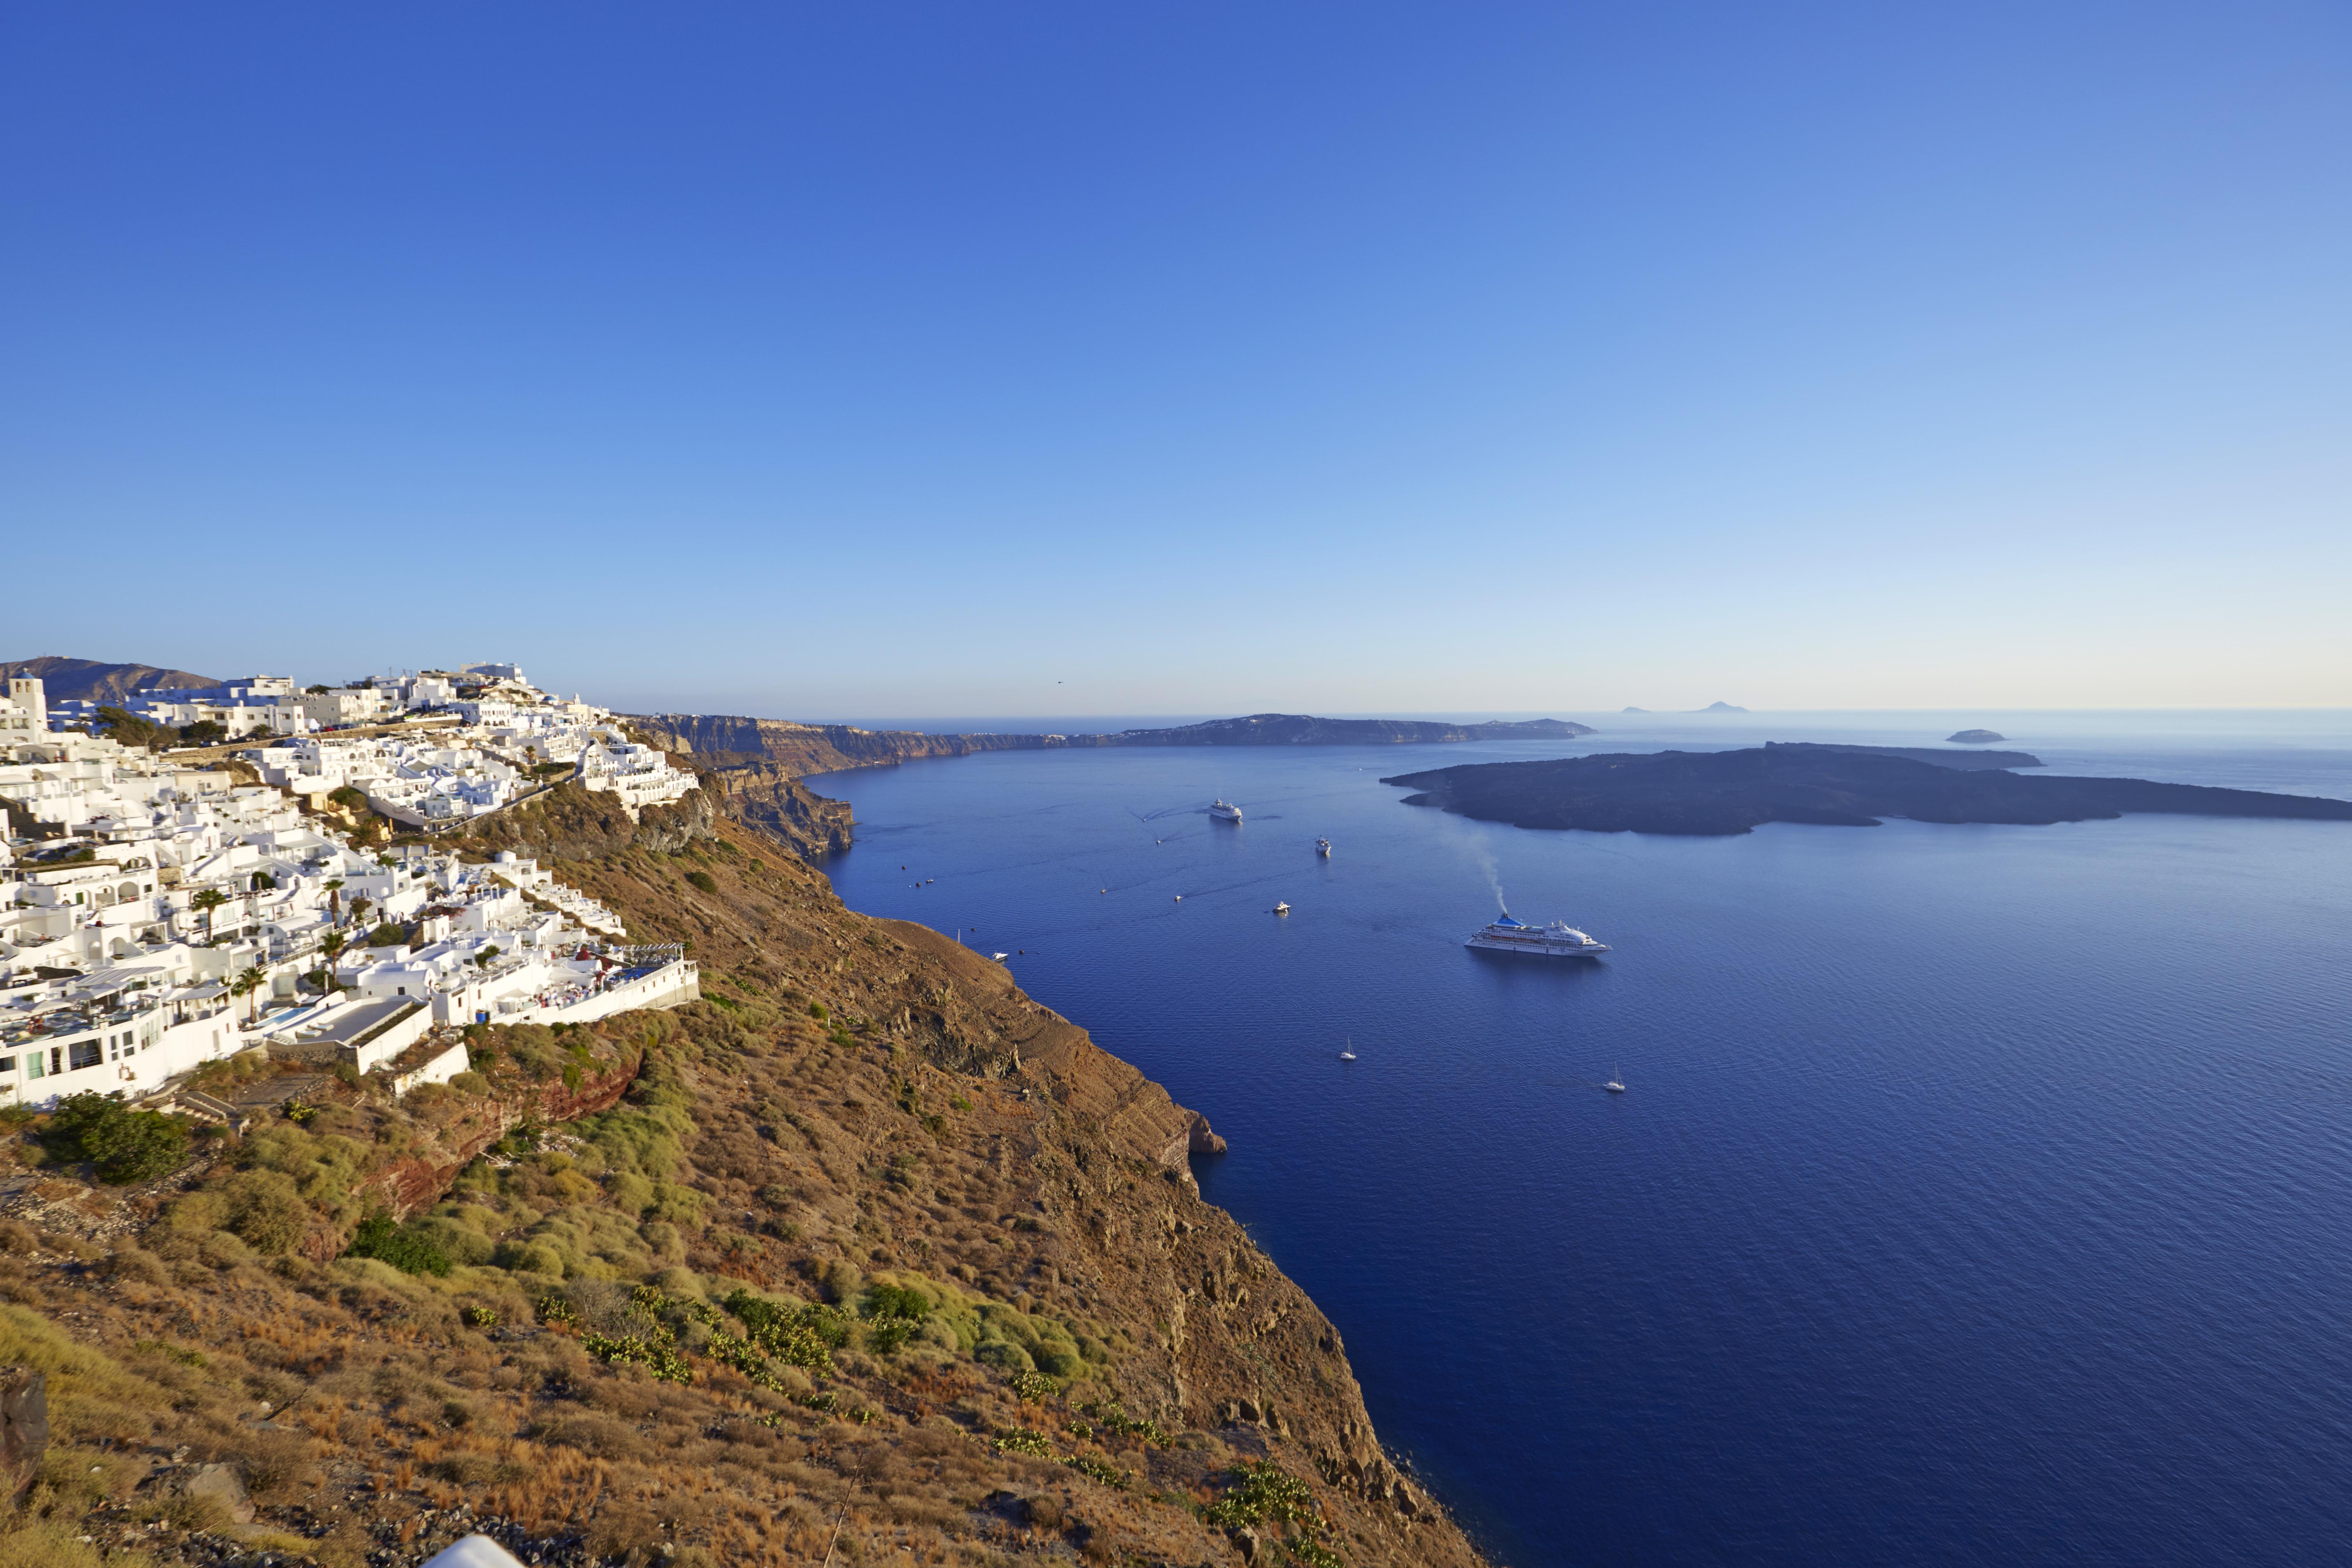 Santorini's Caldera in September. Ira Hotel & Spa in Firostefani